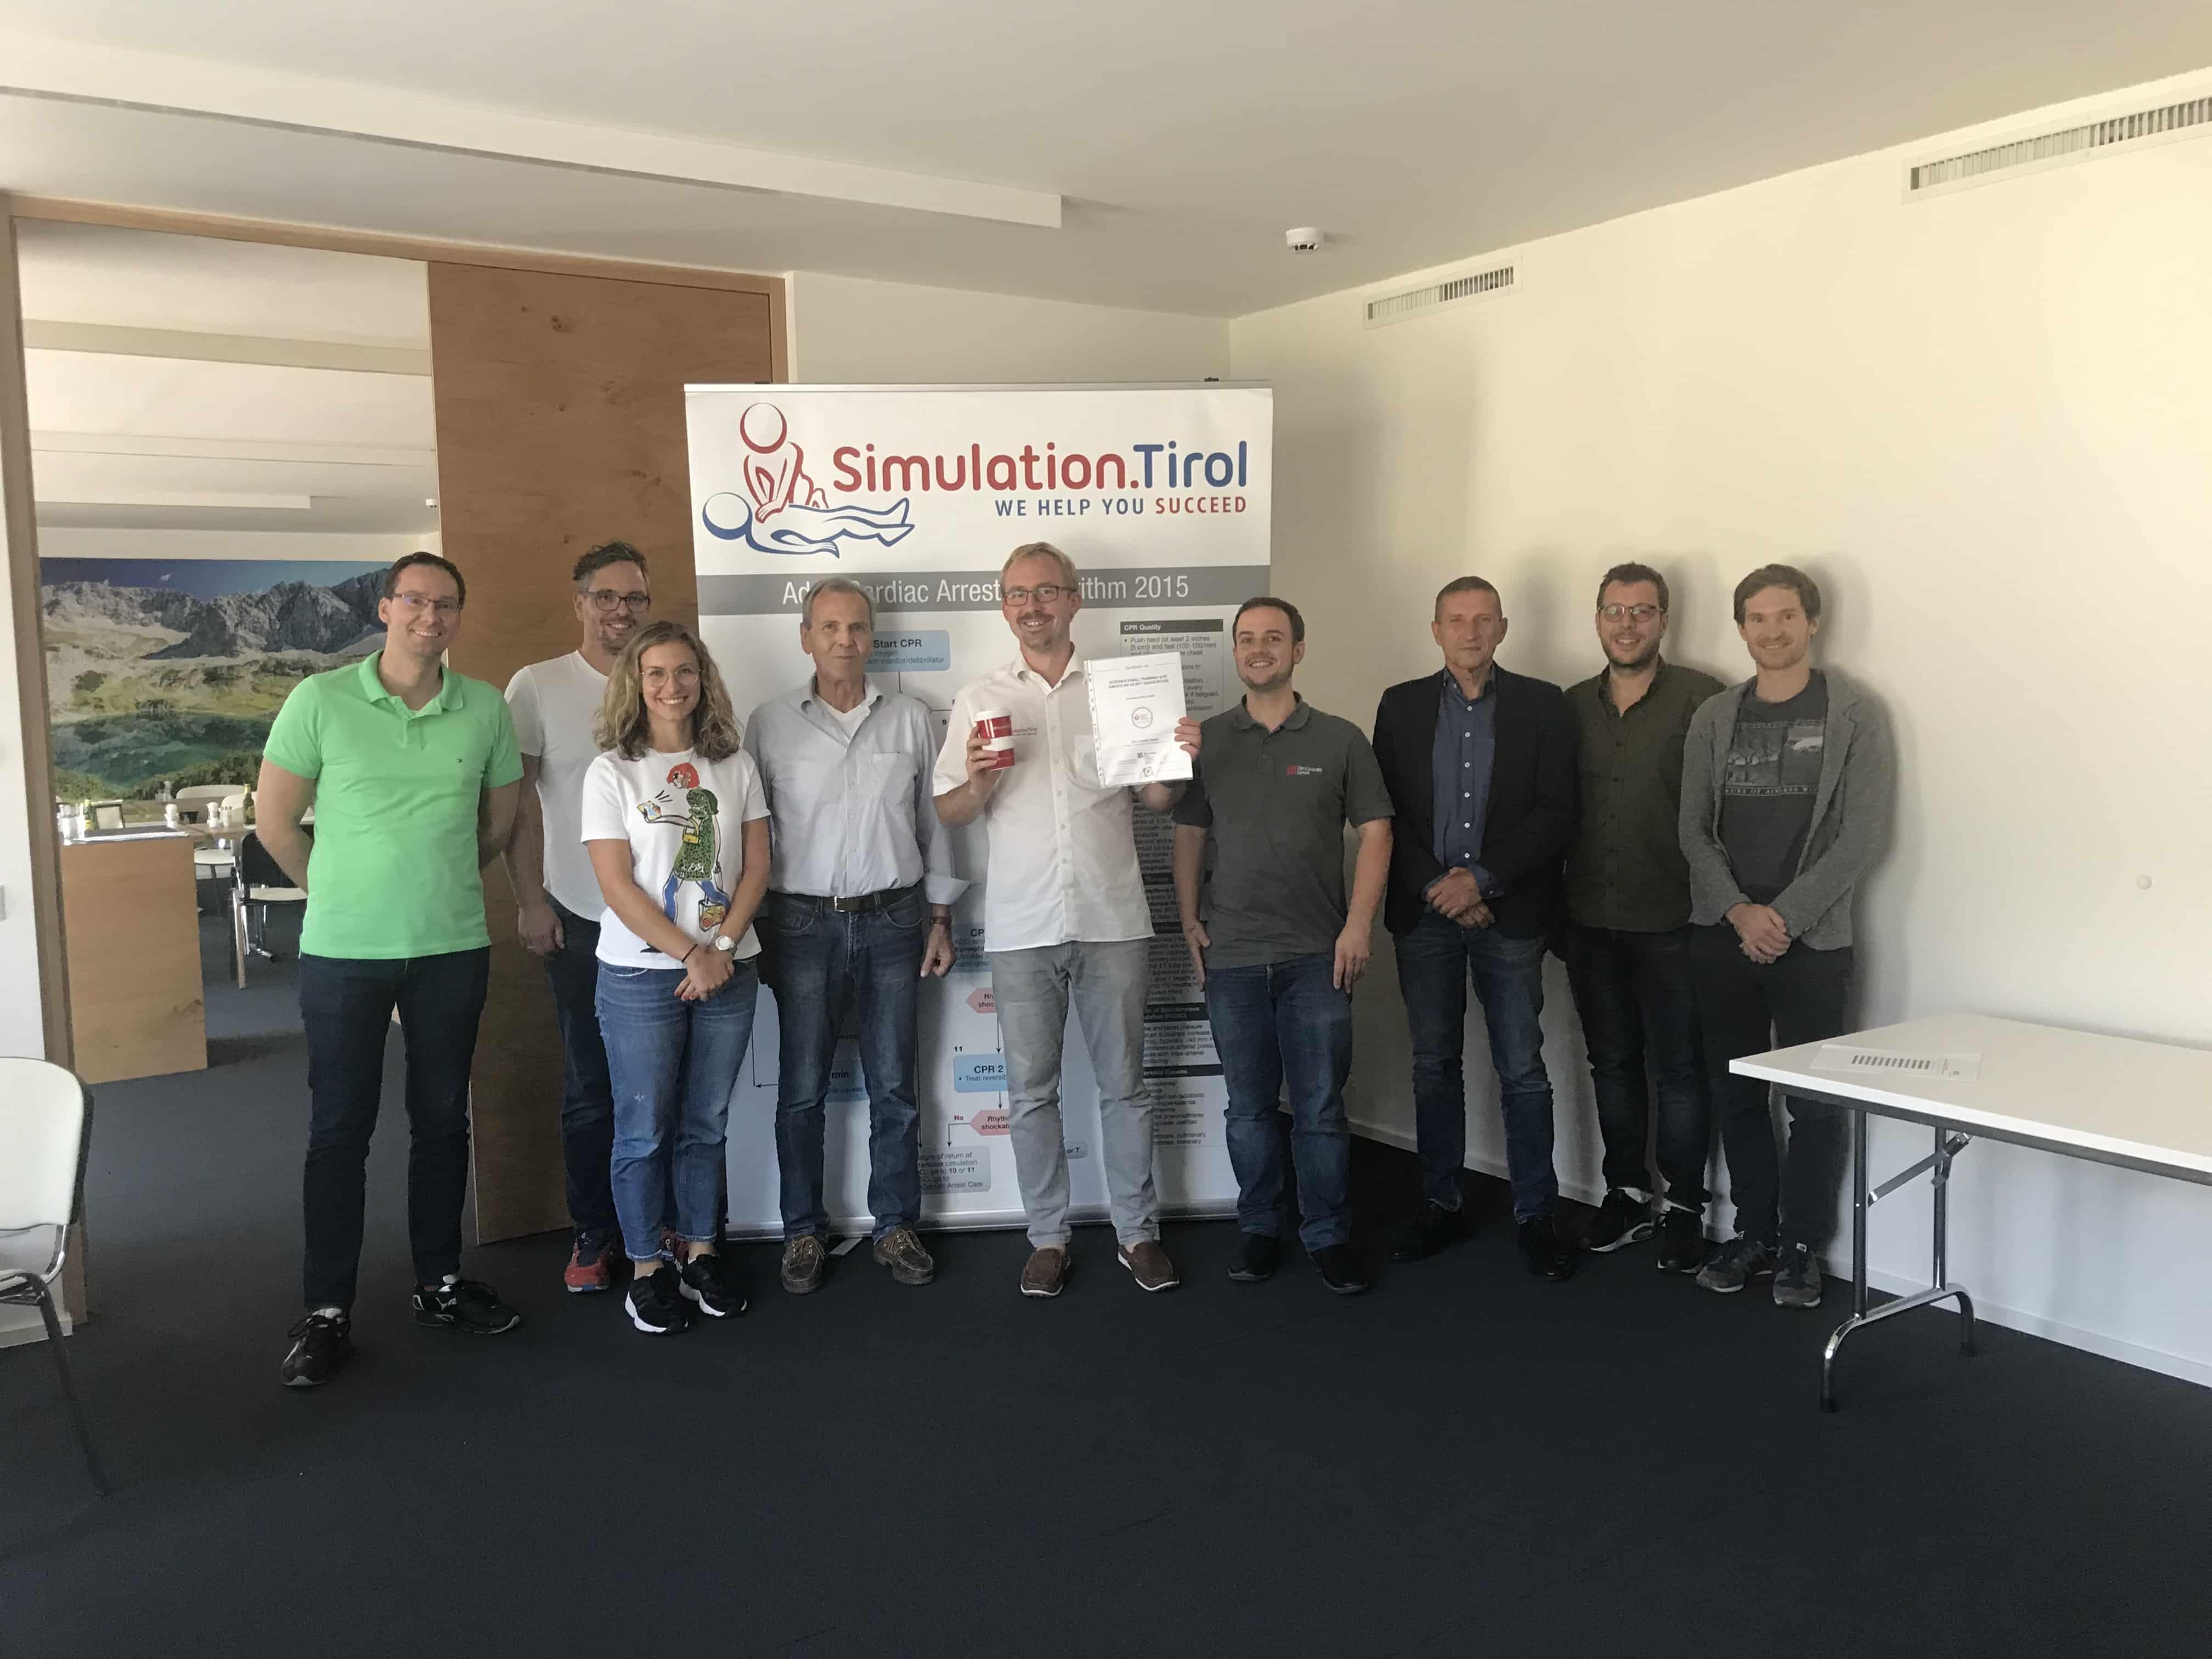 Successful recertification of Simulation.Tirol as International Training Site